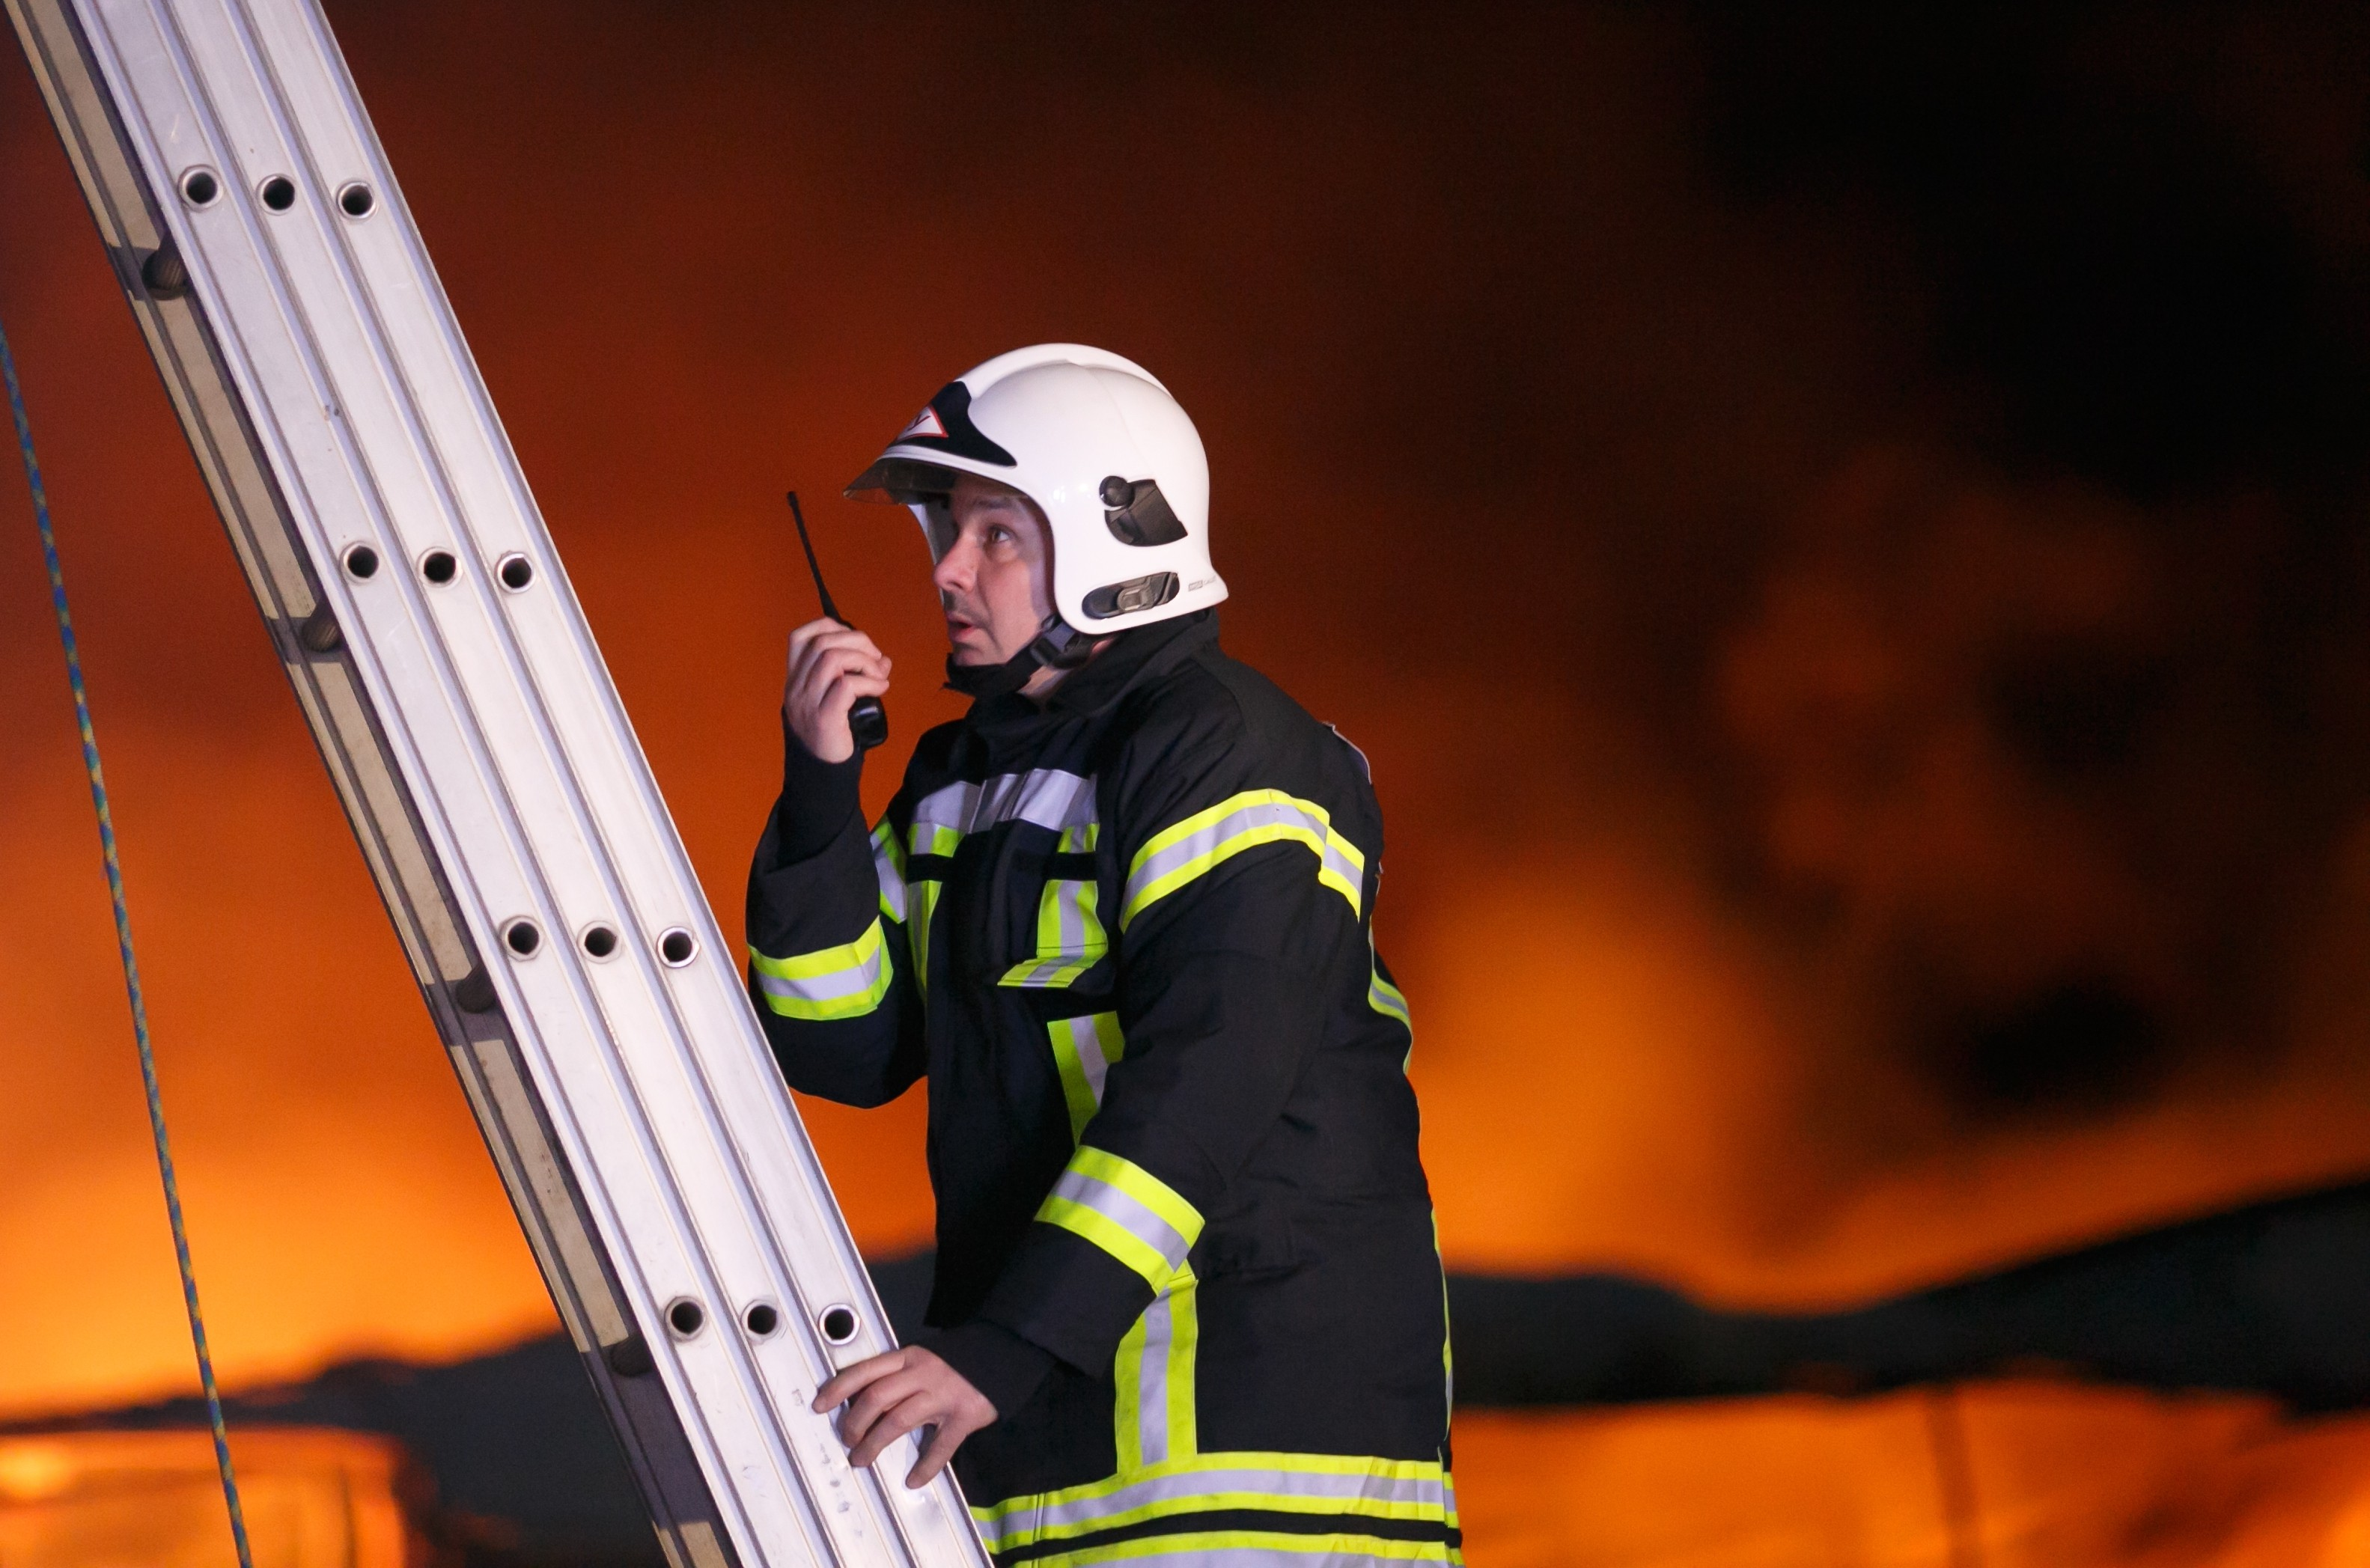 <p><span>Сотрудник противопожарной службы во время тушения пожара. Фото: &copy; РИА Новости</span></p>